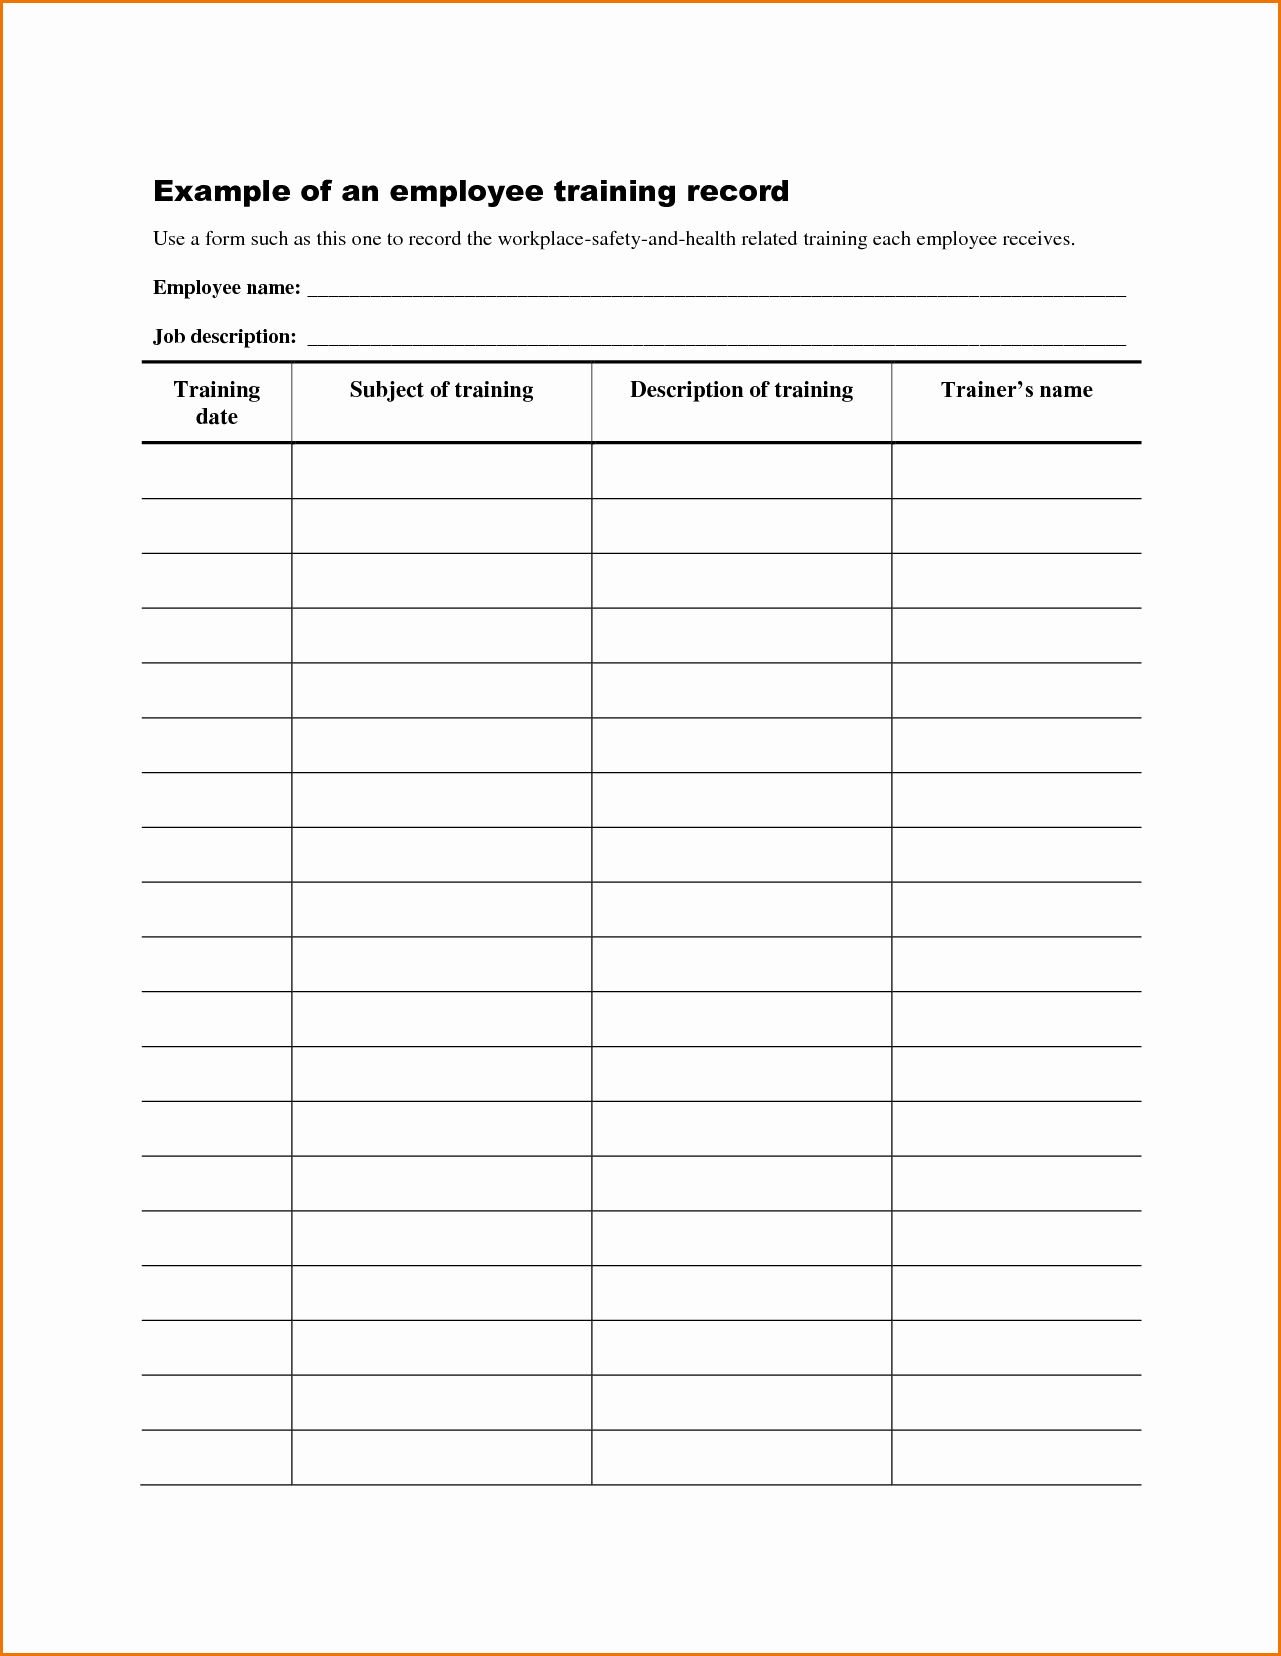 Training Manual Template Microsoft Word Inspirational 10 Employee Training Manual Template Ideas Microsoft